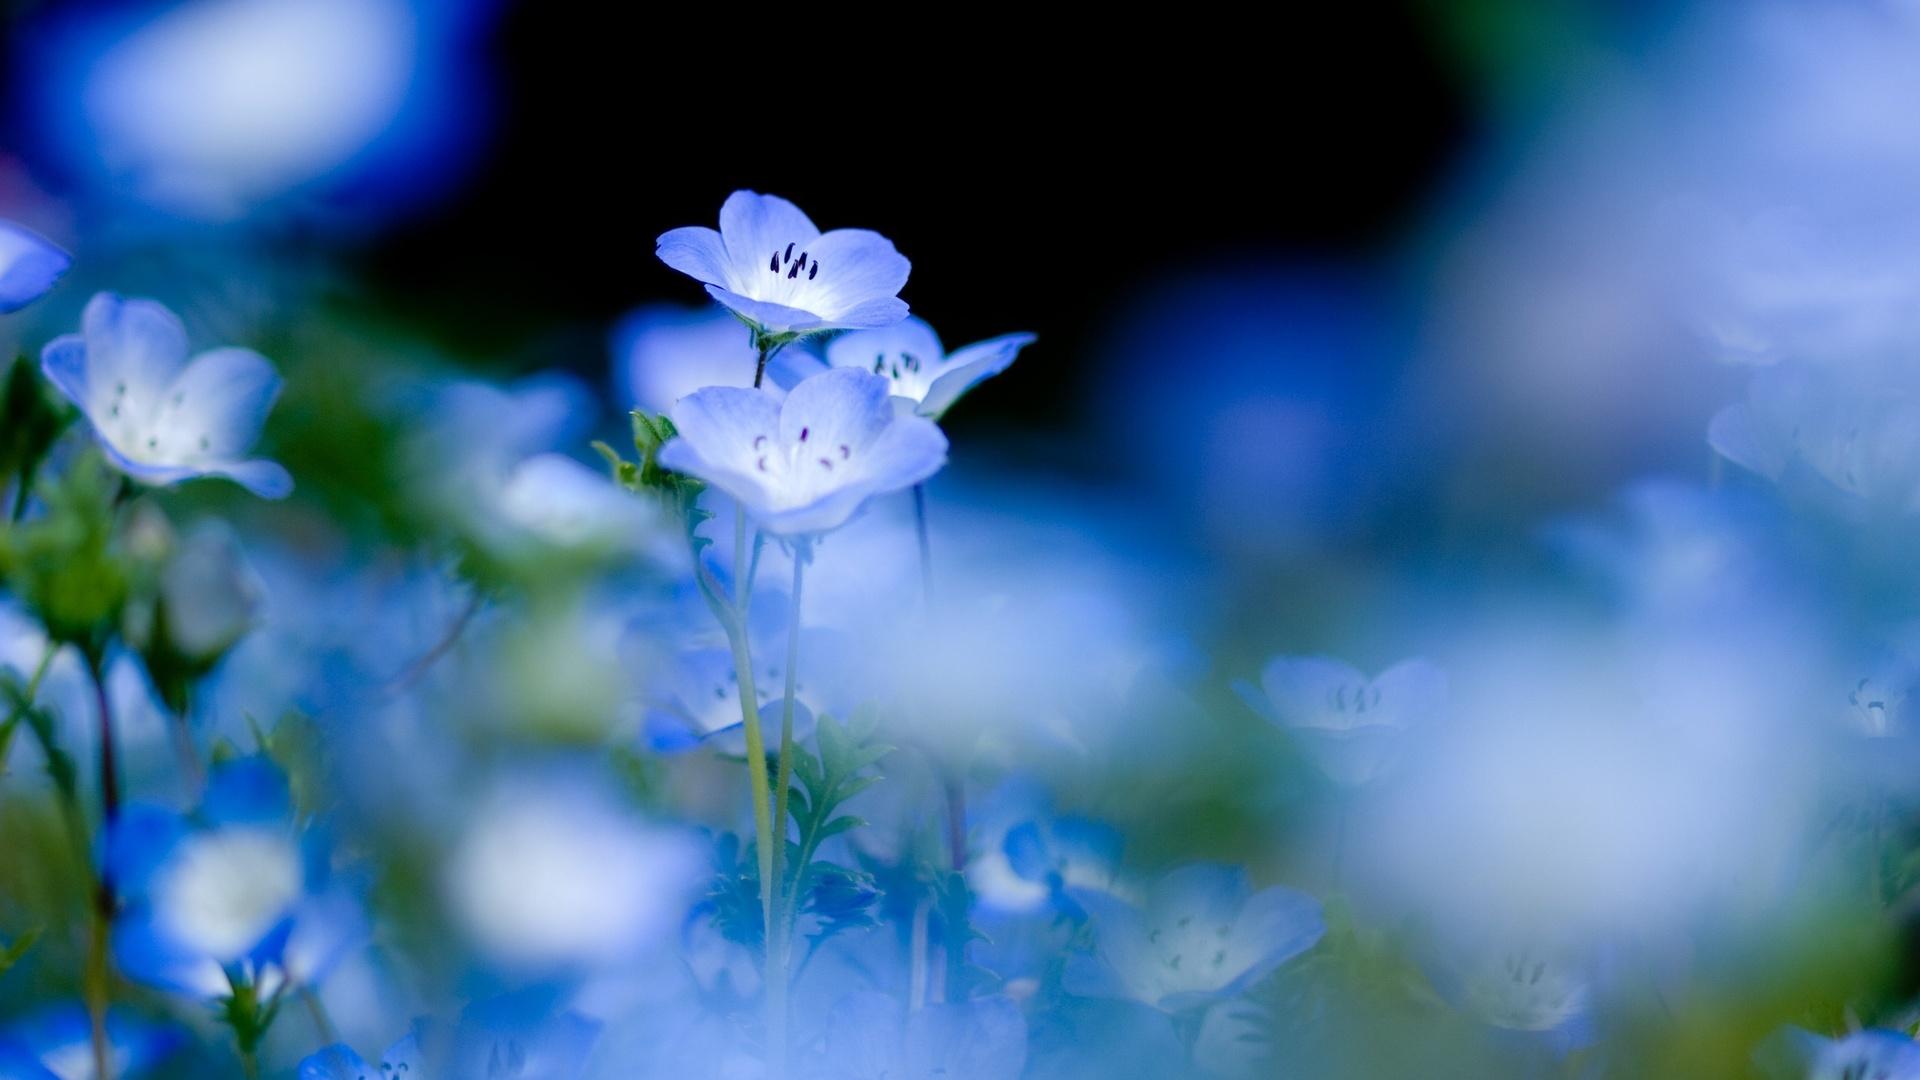 Wildblumen golubenky blumenbeete blumen foto 1920x1080 flowers